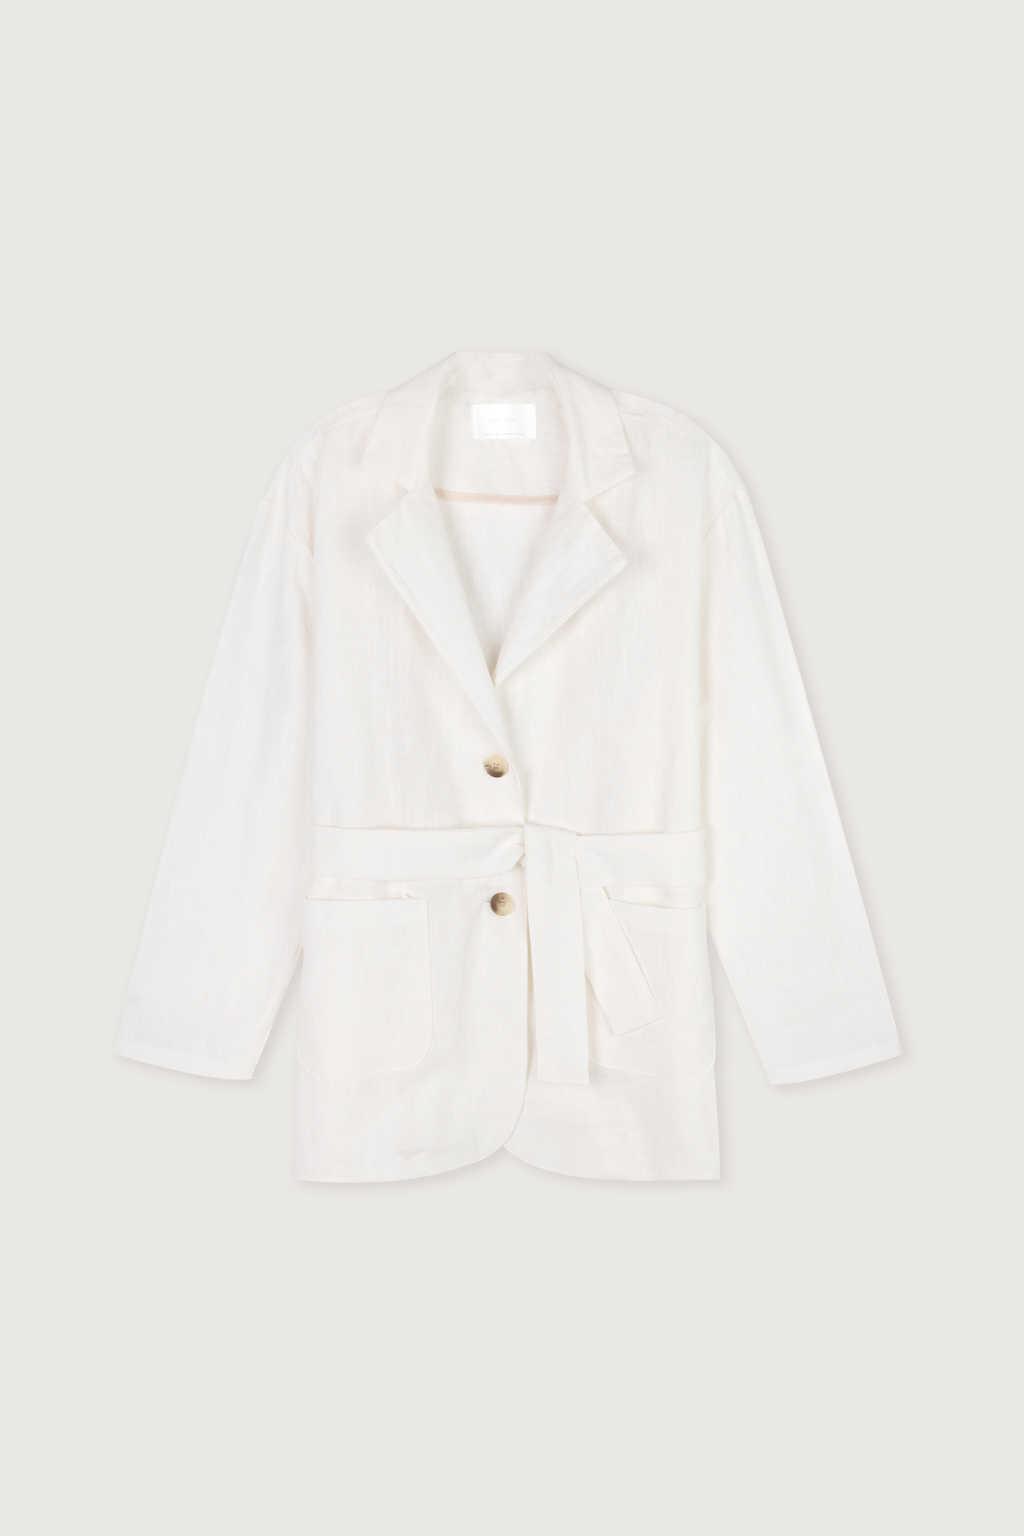 Jacket K019 Cream 6